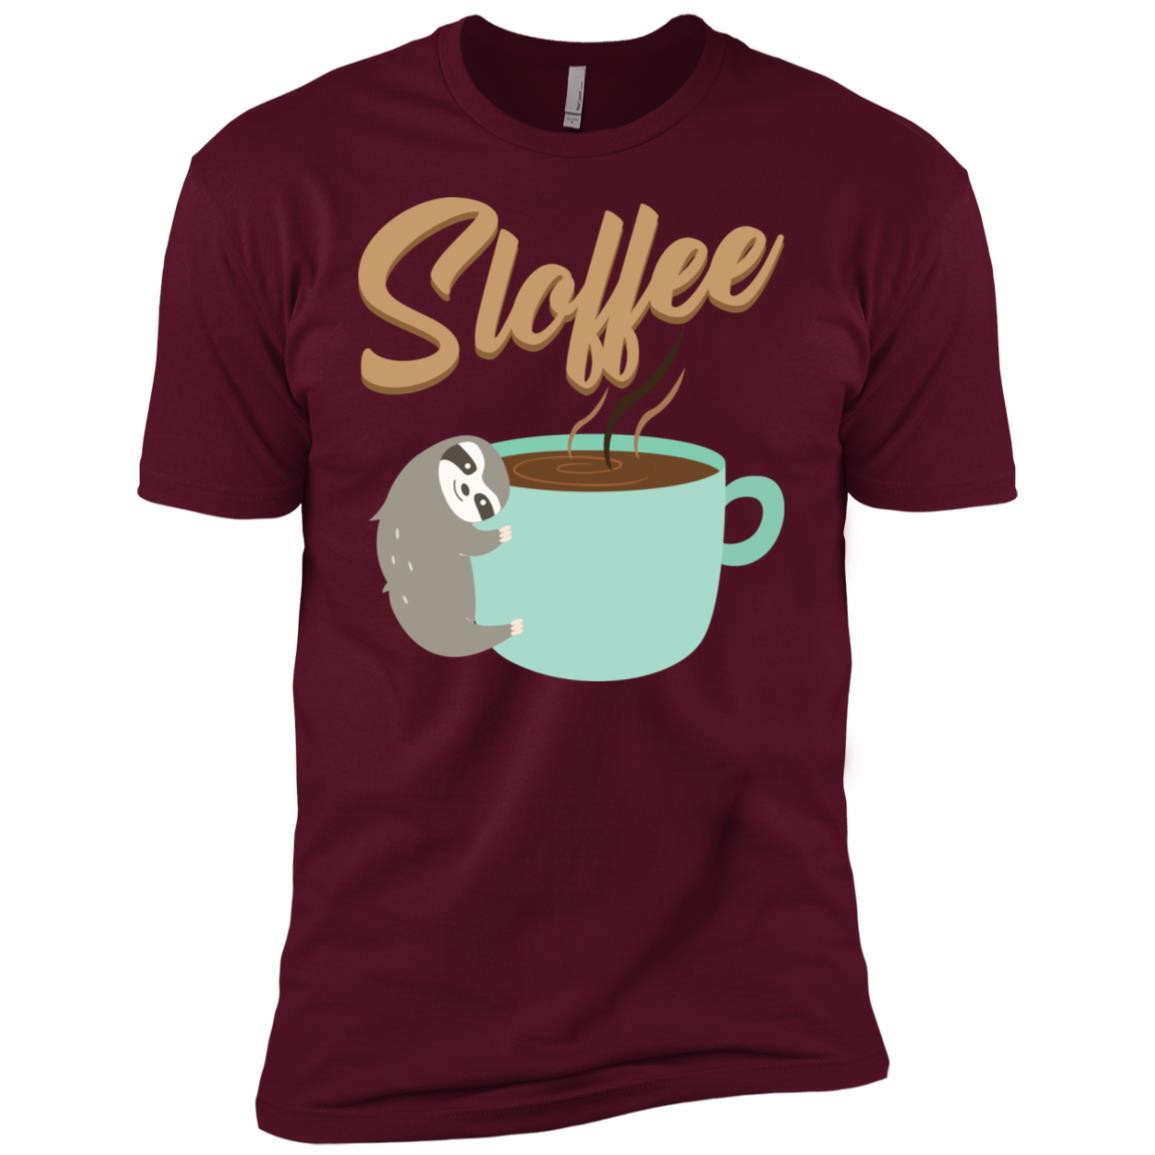 Coffee Sloffee Pun Sloth Caffeine Men Short Sleeve T-Shirt